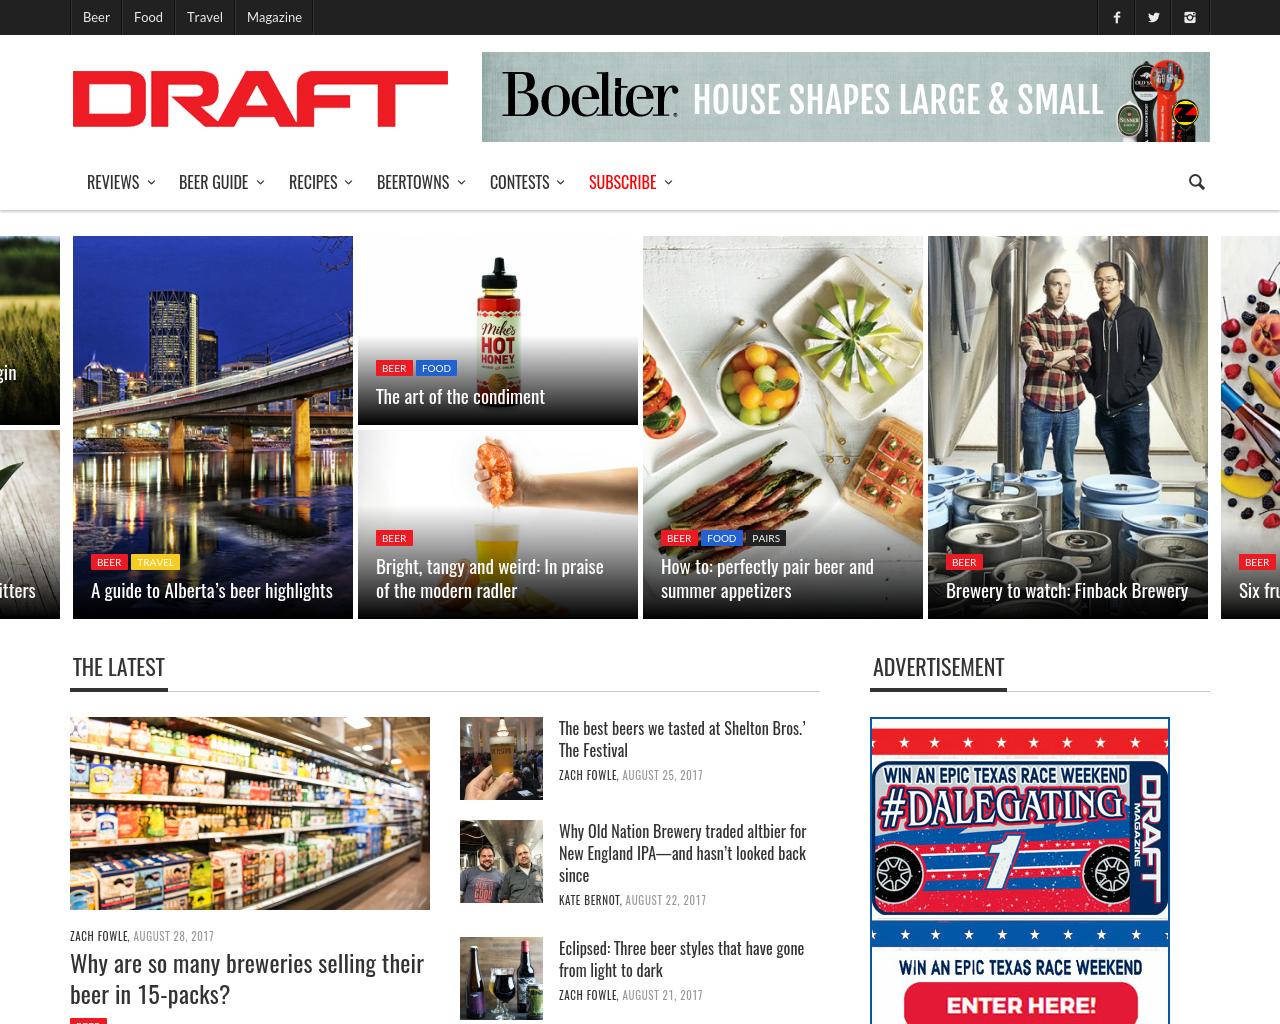 DRAFT-Magazine-Advertising-Reviews-Pricing